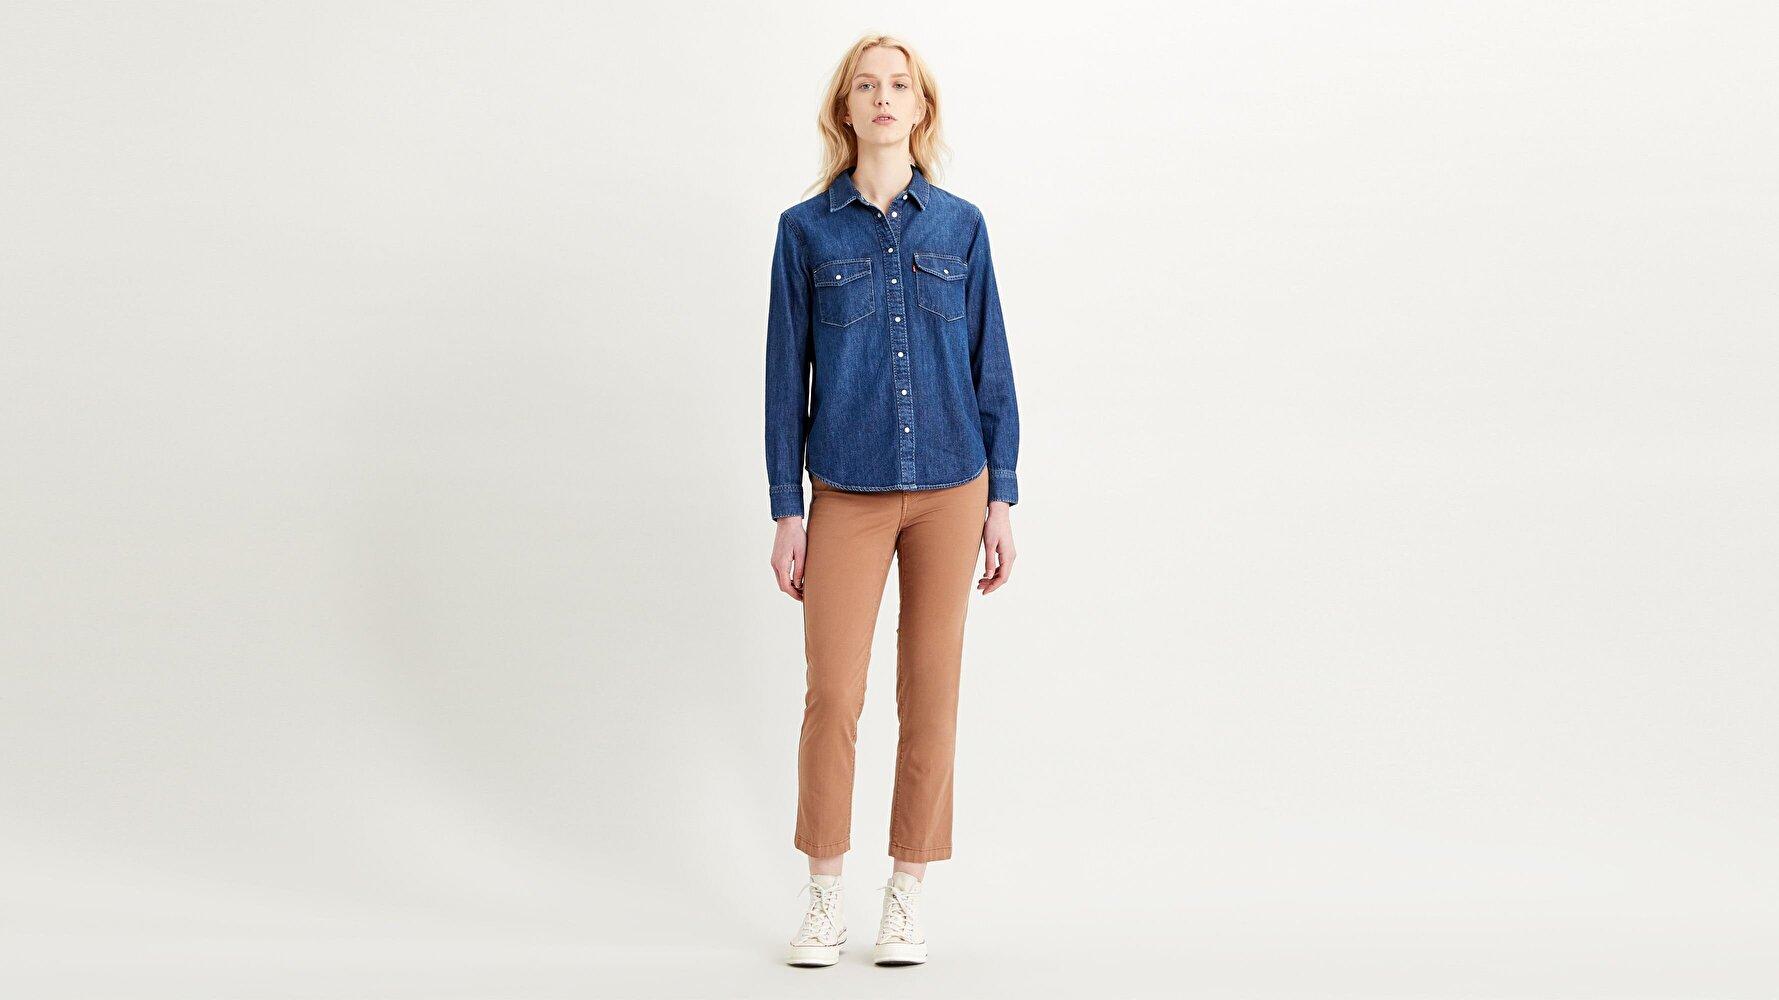 724 Yüksek Bel Düz Kesim Cropped Kadın Jean Pantolon-Soft Canvas Toasted Coconut